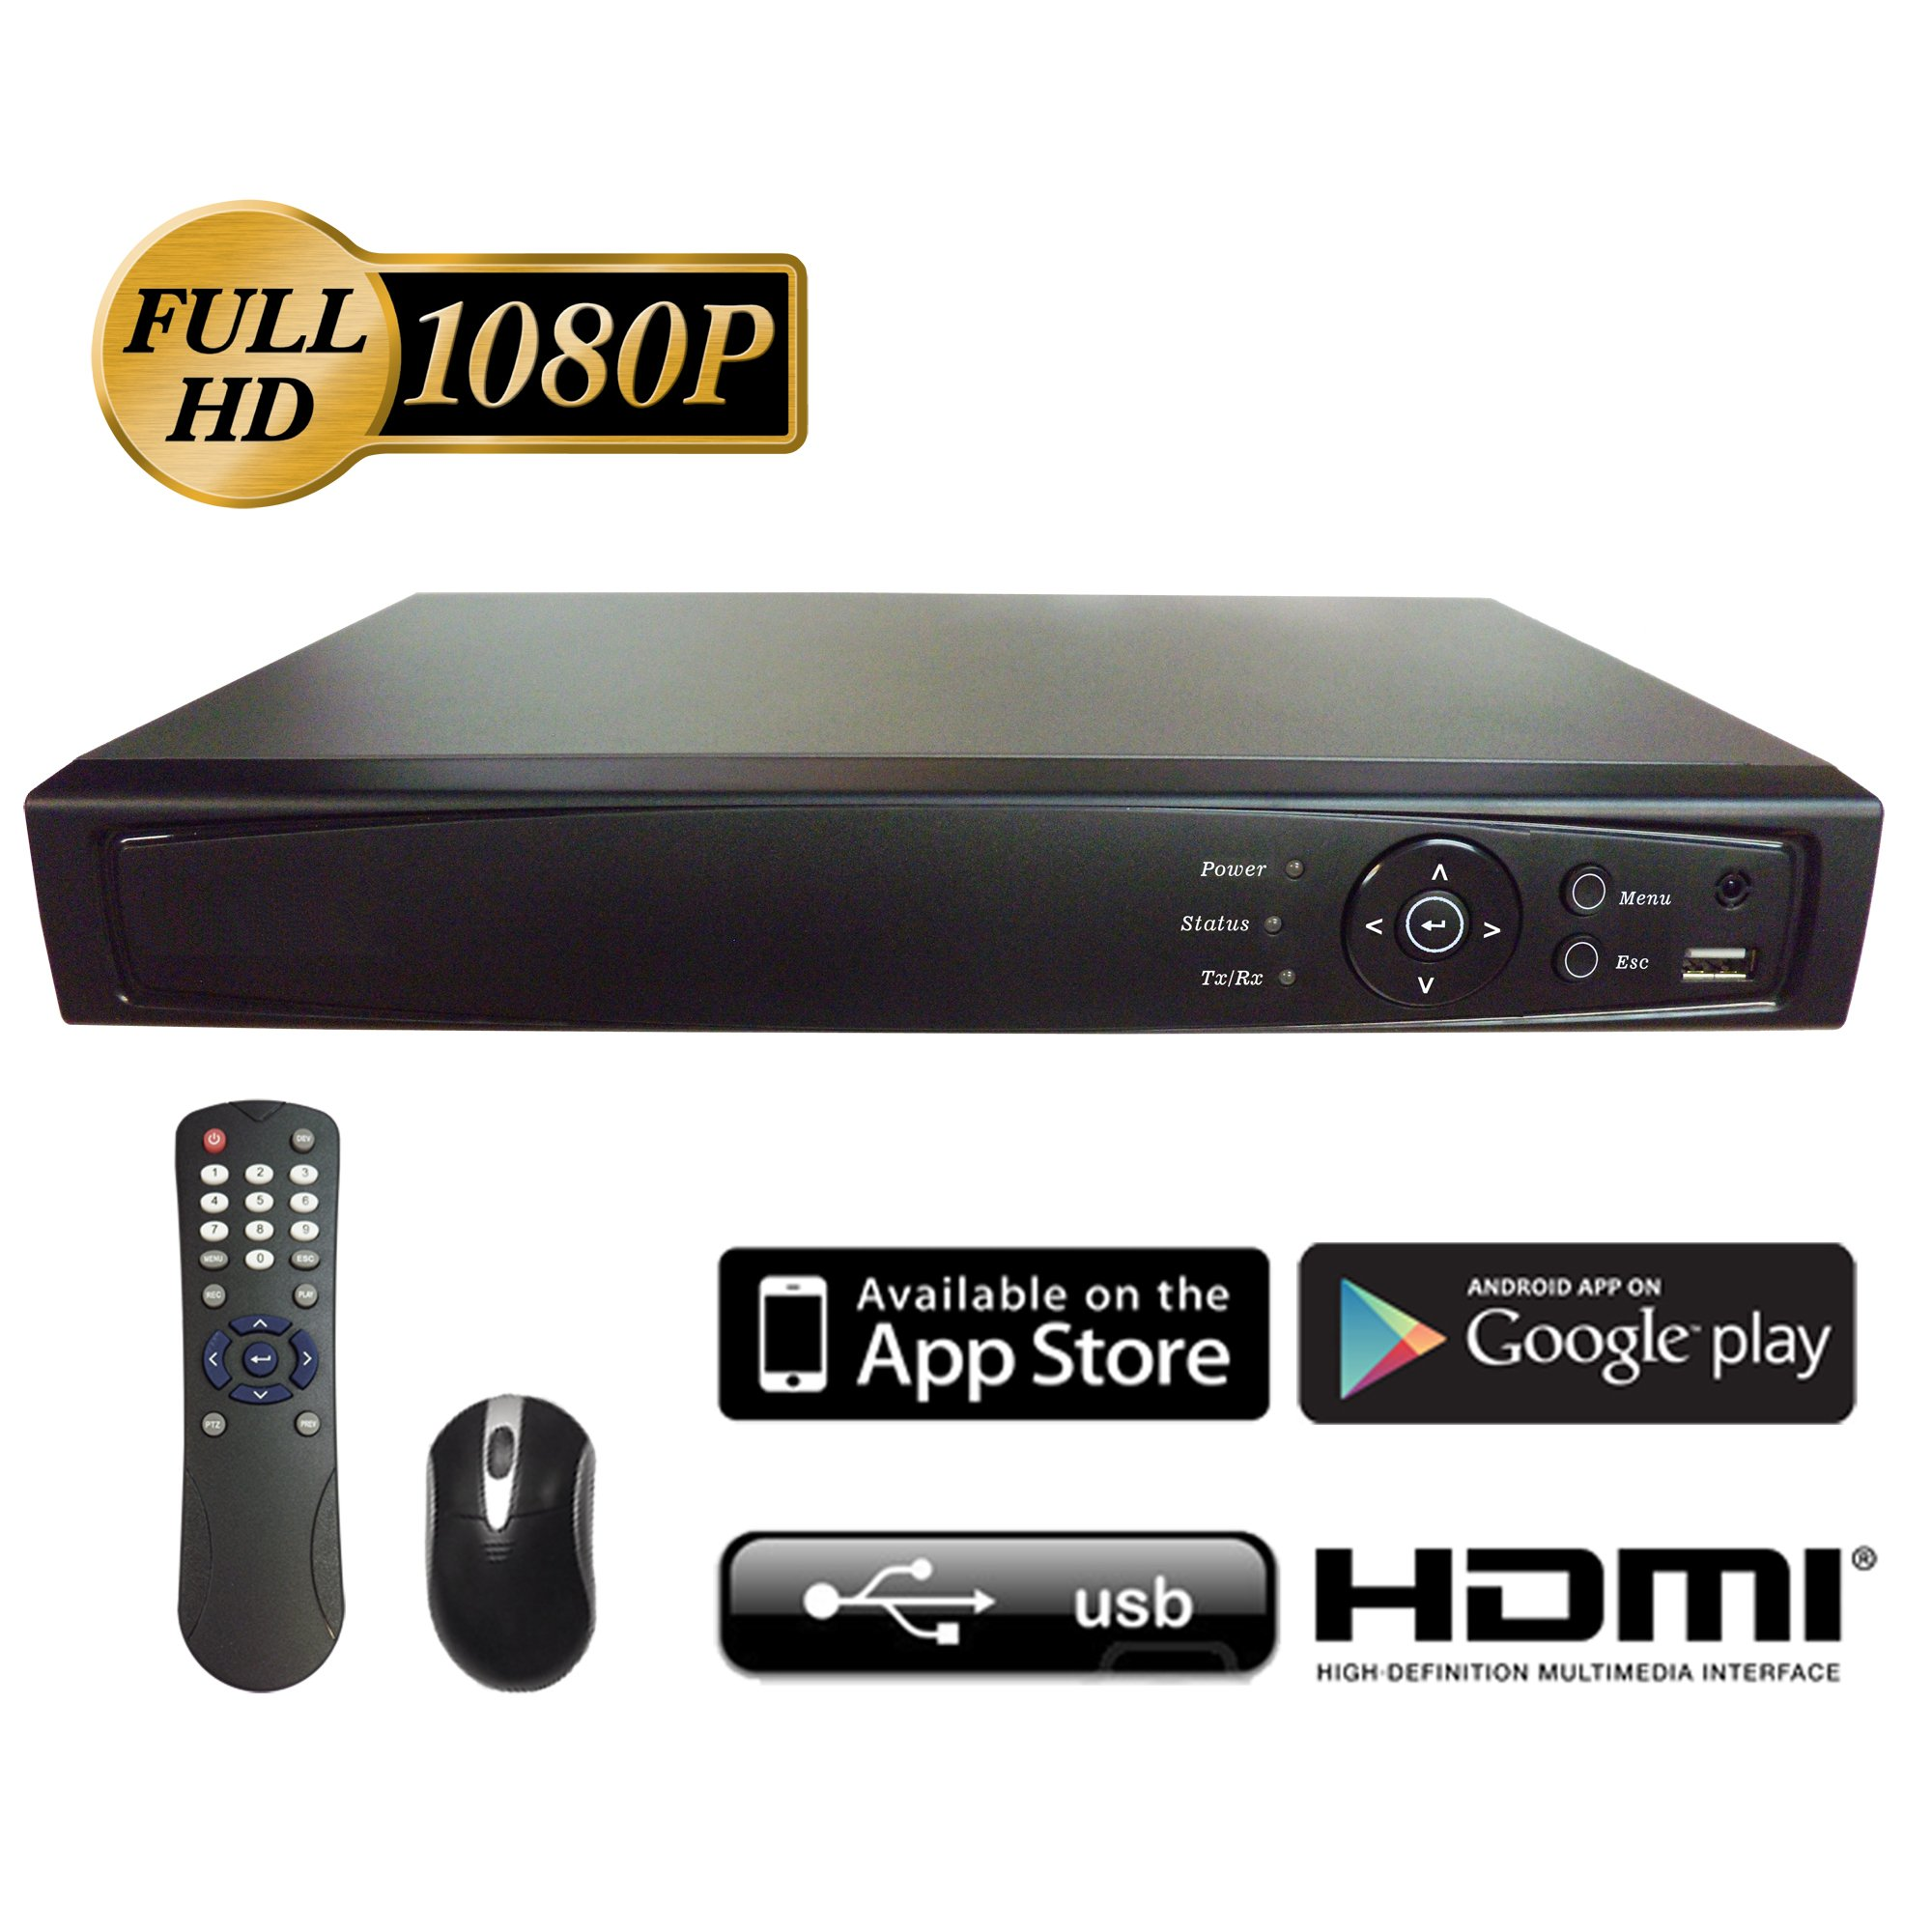 Surveillance Digital Video Recorder 16CH HD-TVI/CVI/AHD H264 Full-HD DVR 2TB HDD HDMI/VGA/BNC Video Output Cell Phone APPs for Home/ Office Work @1080P/720P TVI&CVI, 1080P AHD, Standard Analog& IP Cam by 101 AV Inc